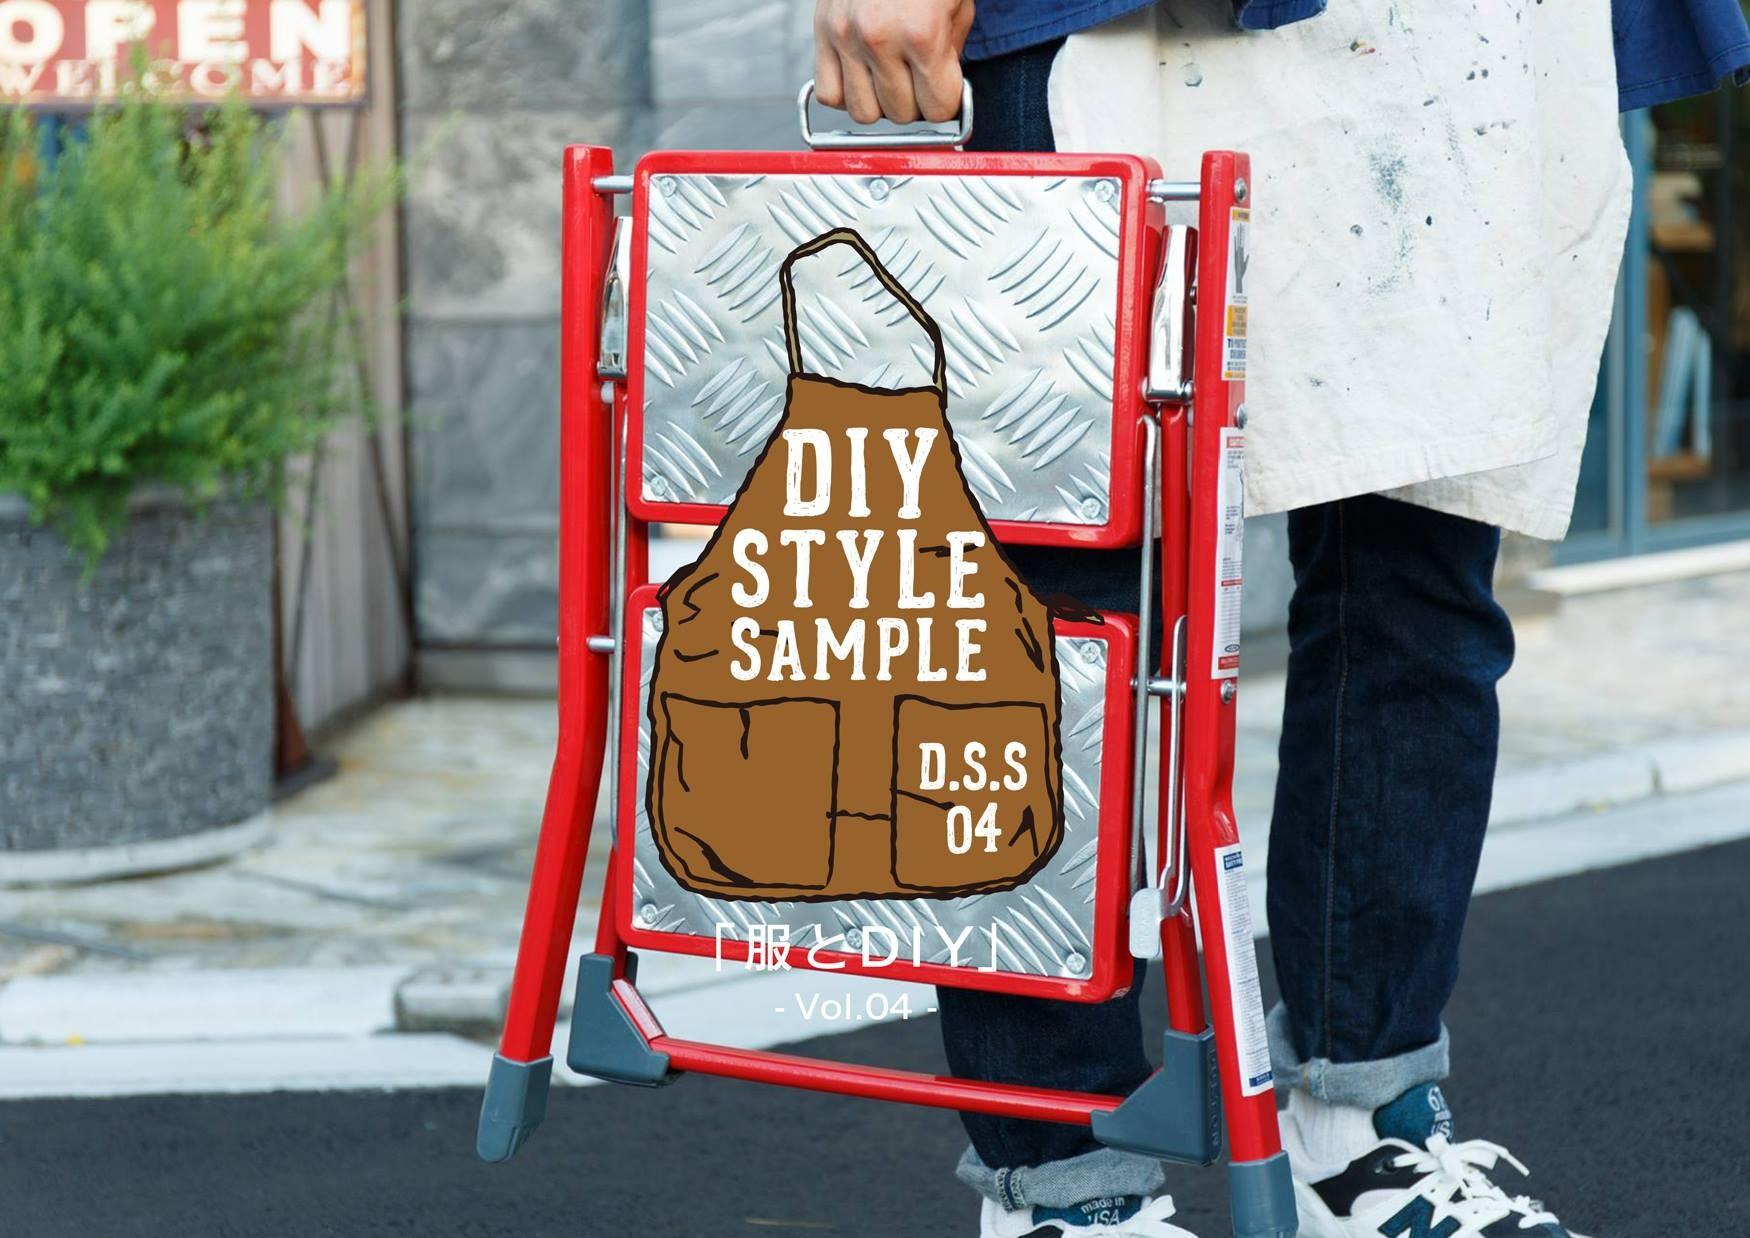 DIY STYLE SAMPLE 「服とDIY」-Vol. 04-